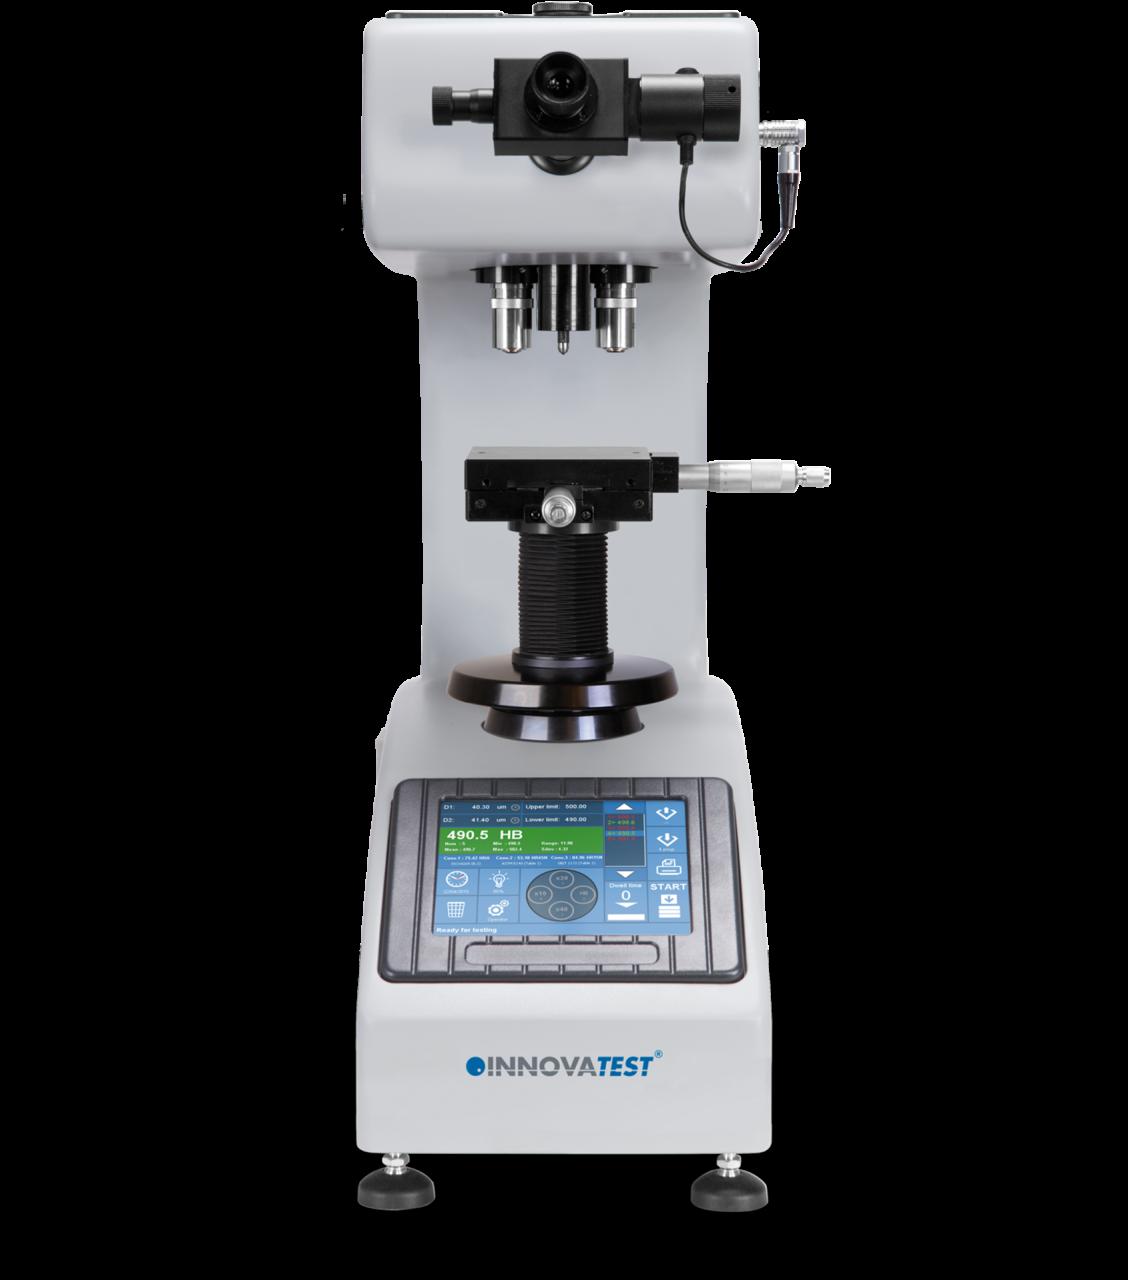 innovatest-nova-330-front-vickers-hardness-tester